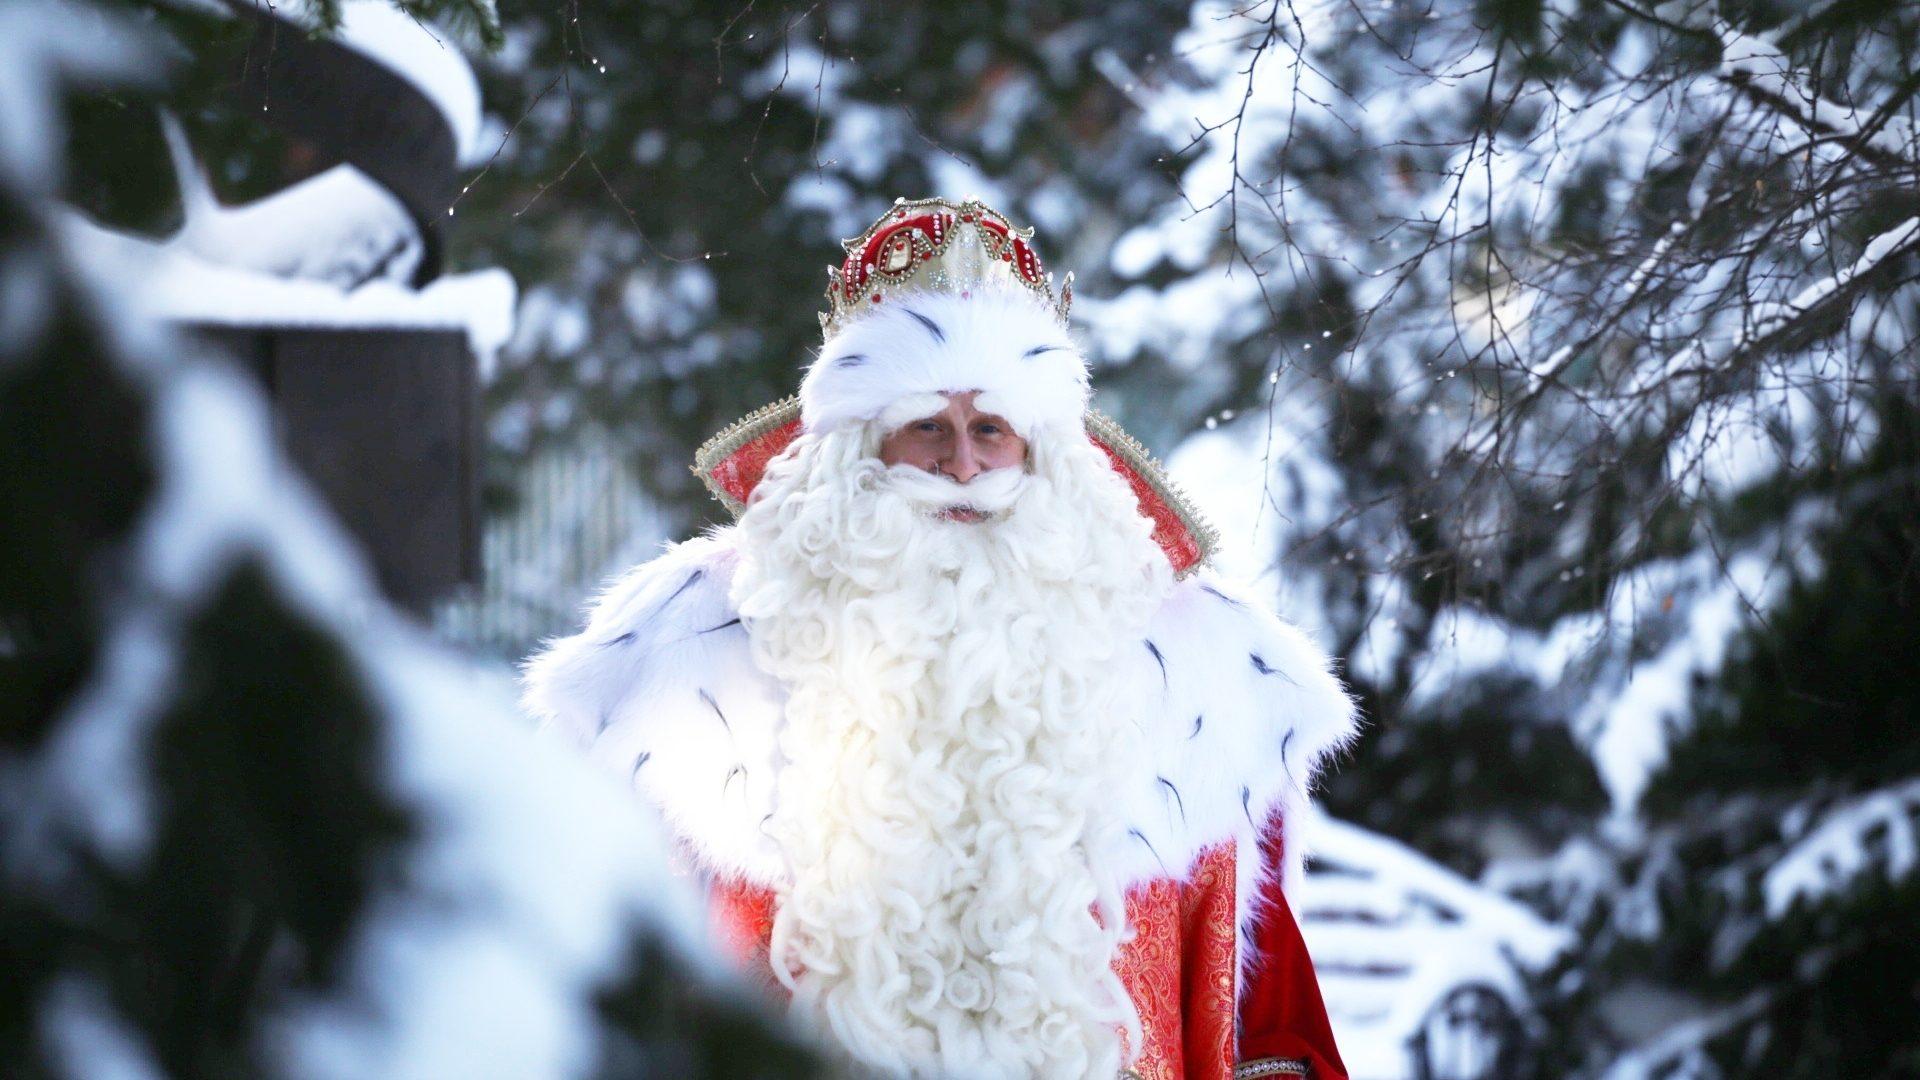 Дед Мороз из Великого Устюга в Томске